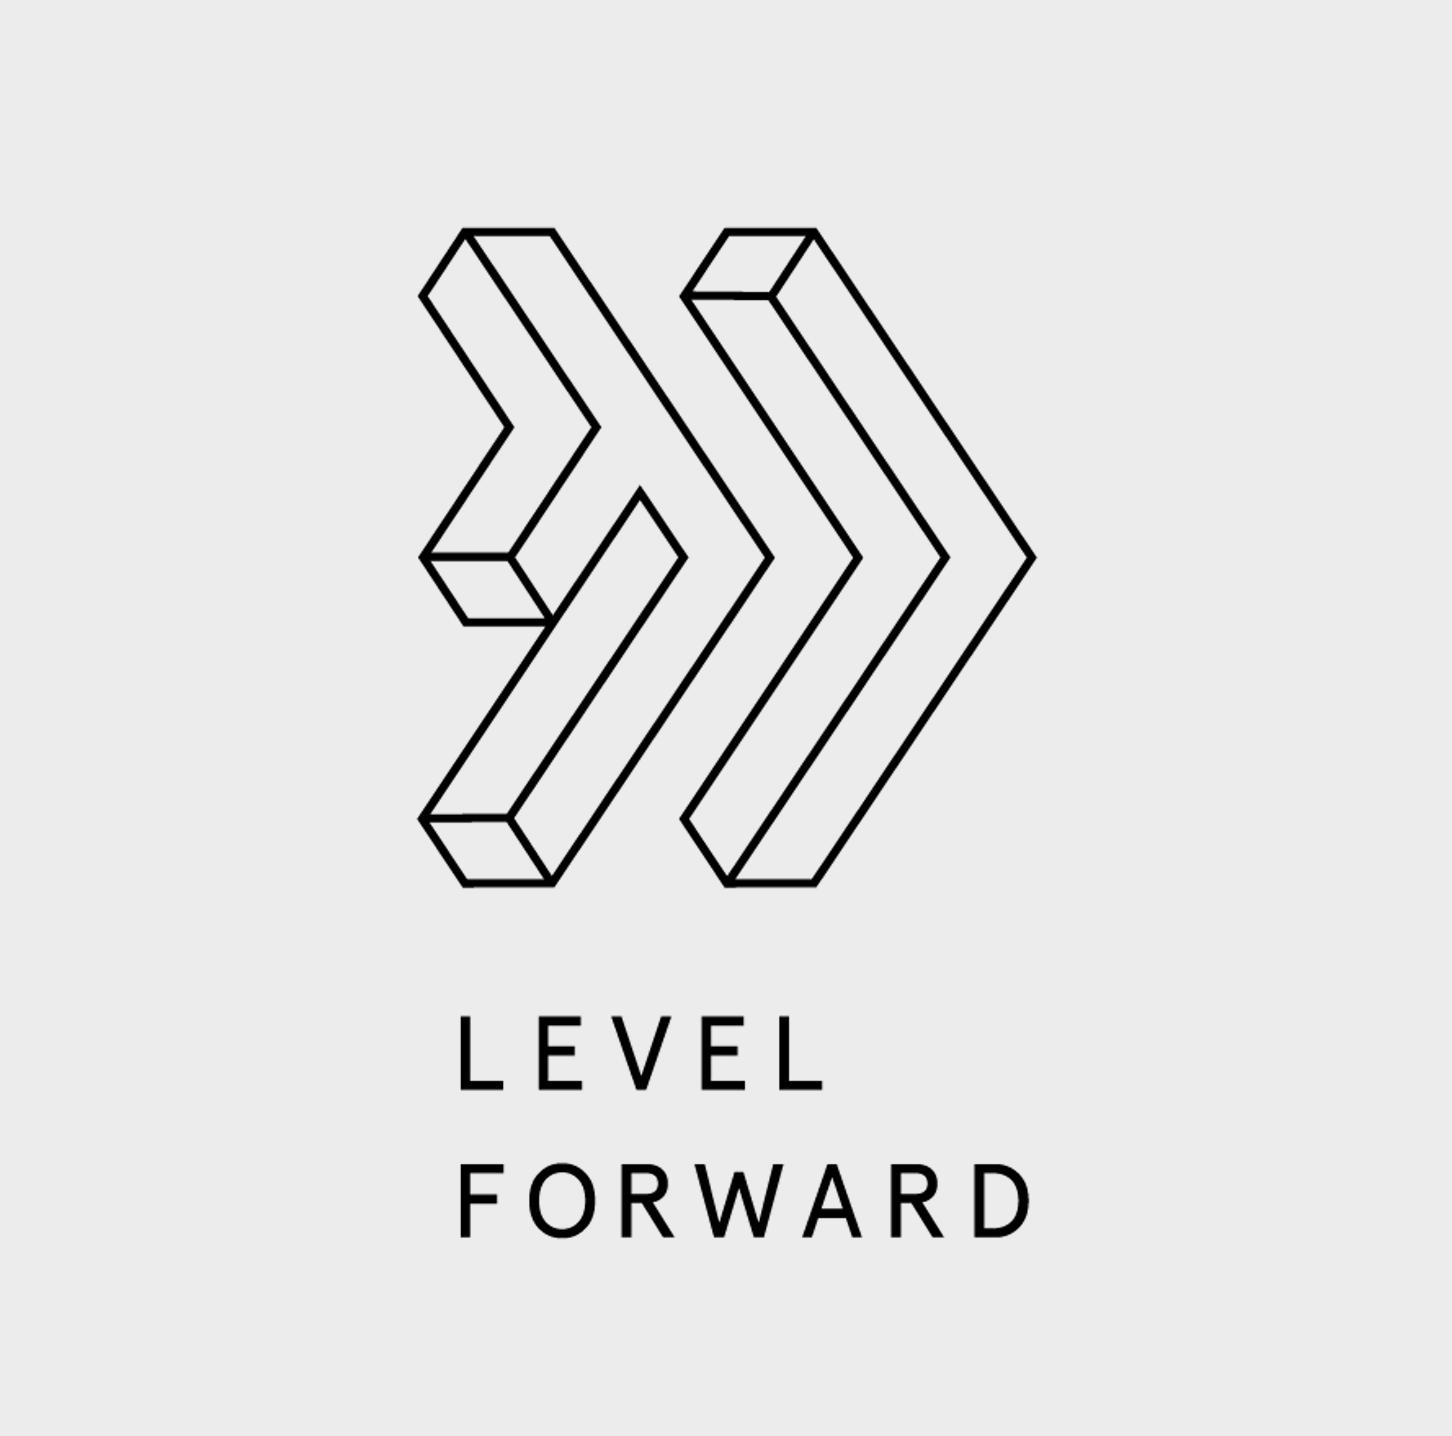 Level Forward